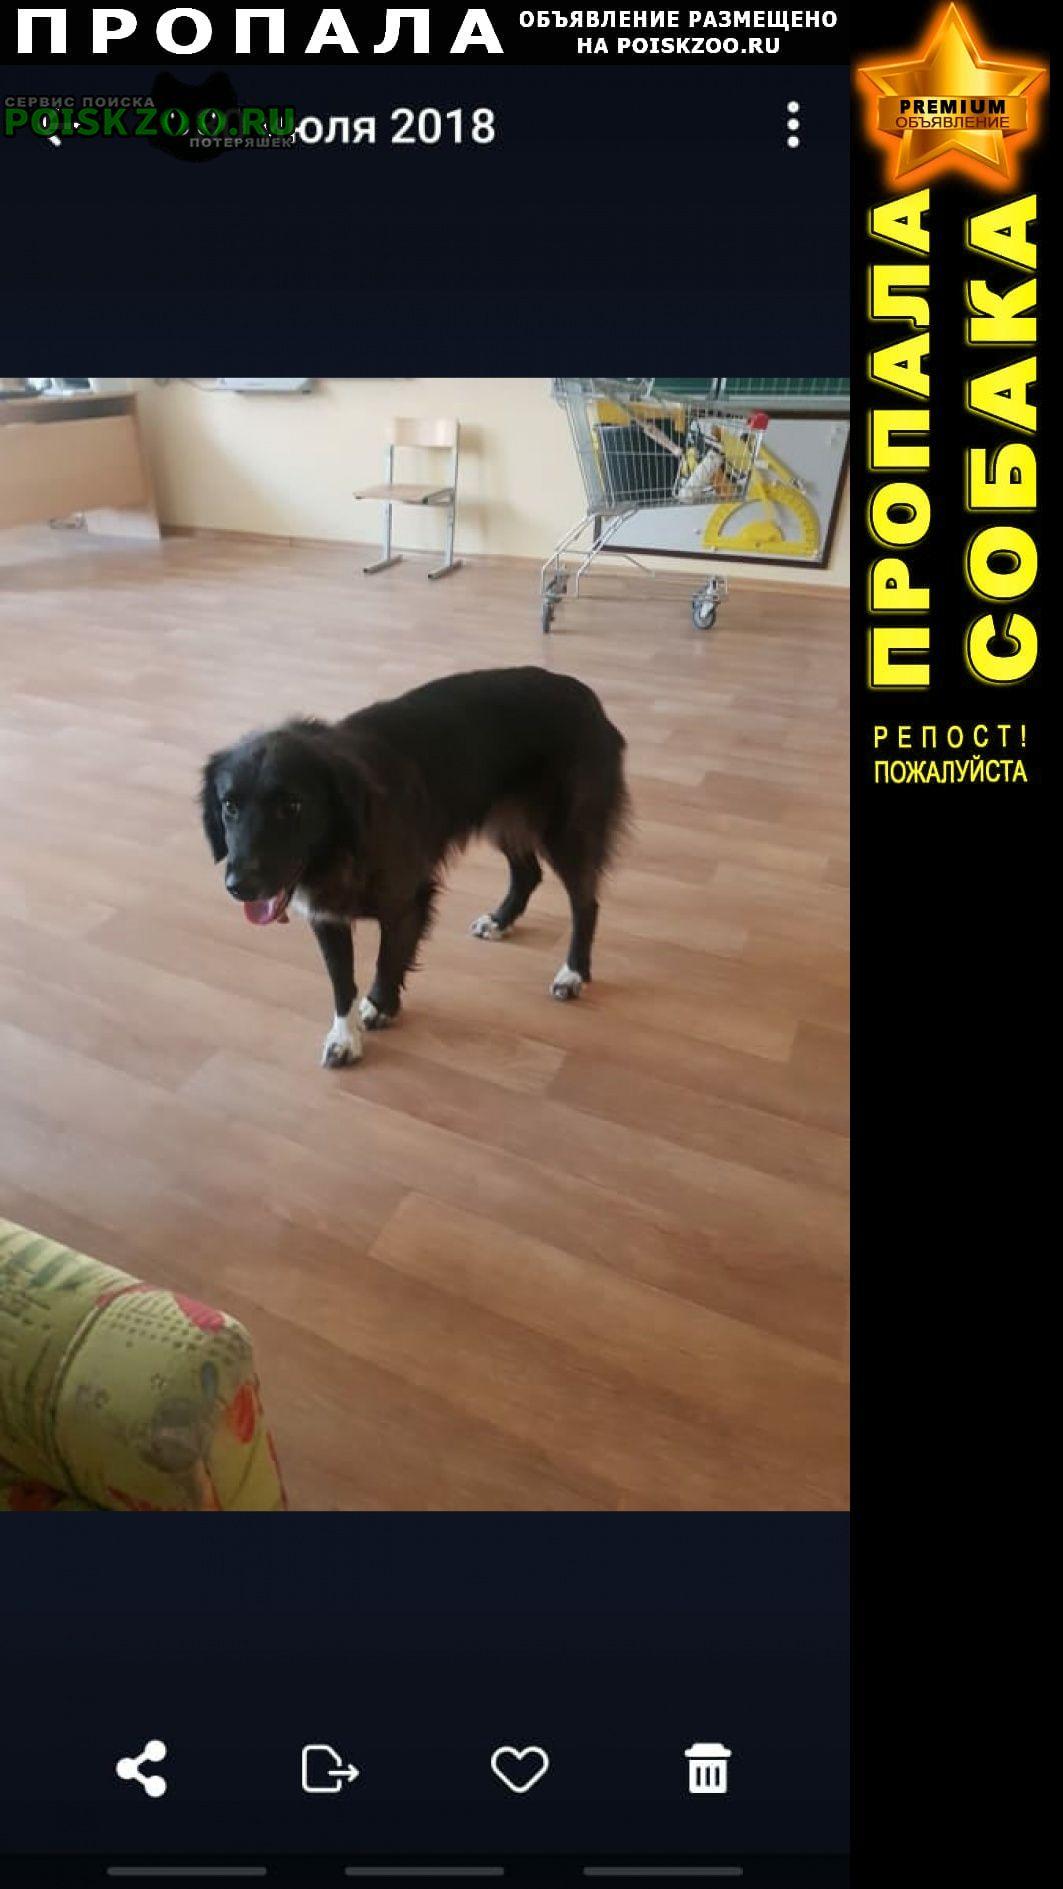 Пропала собака Заплюсье